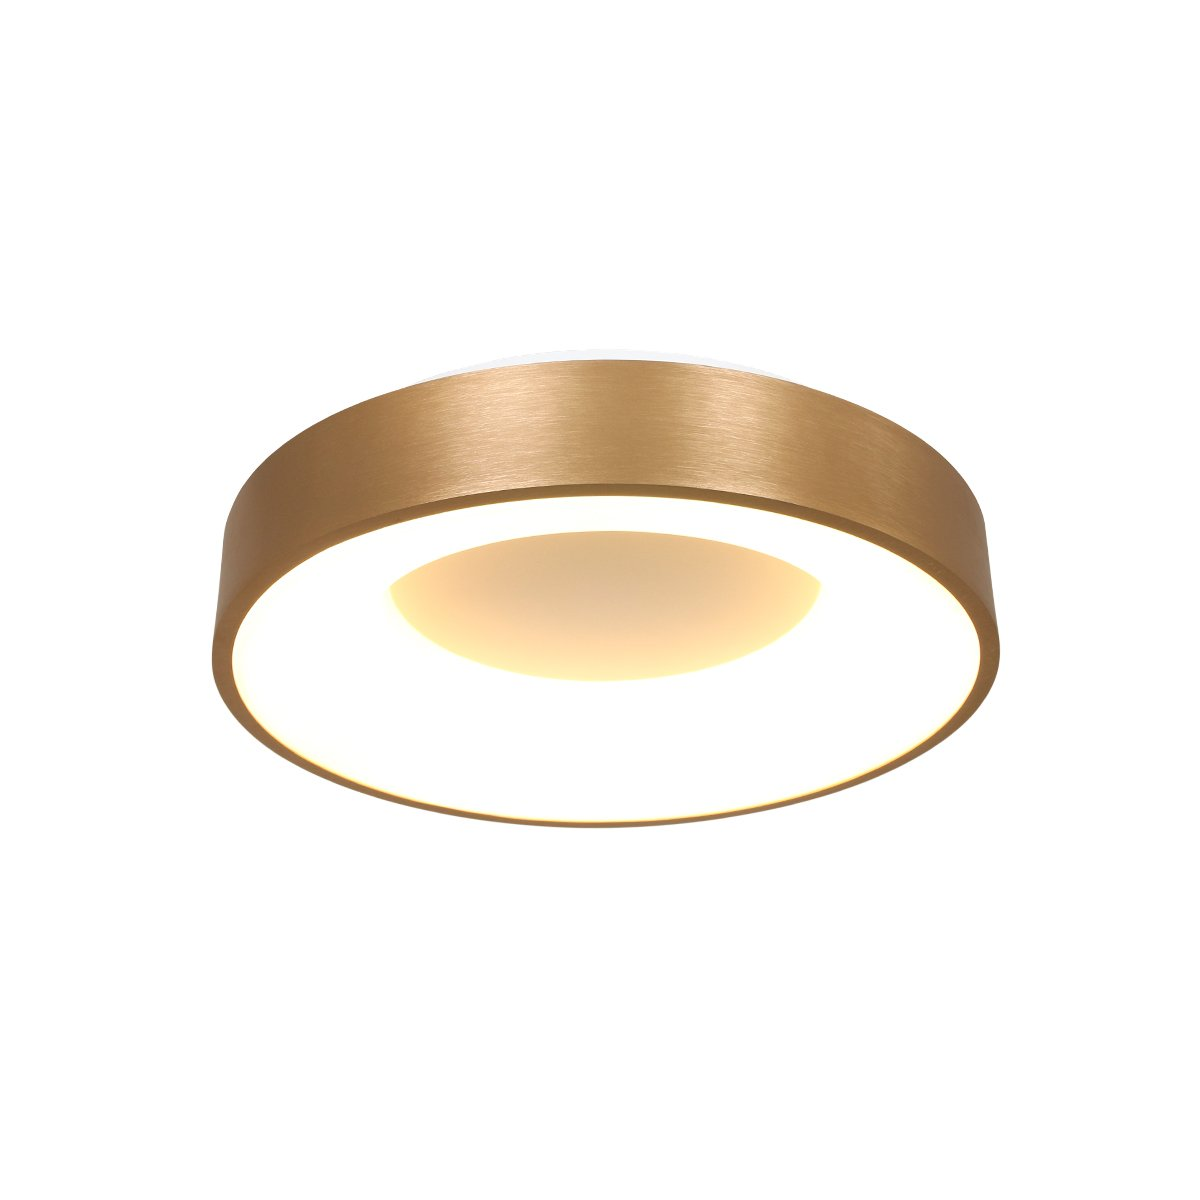 Plafondlamp Steinhauer 2562 Goud